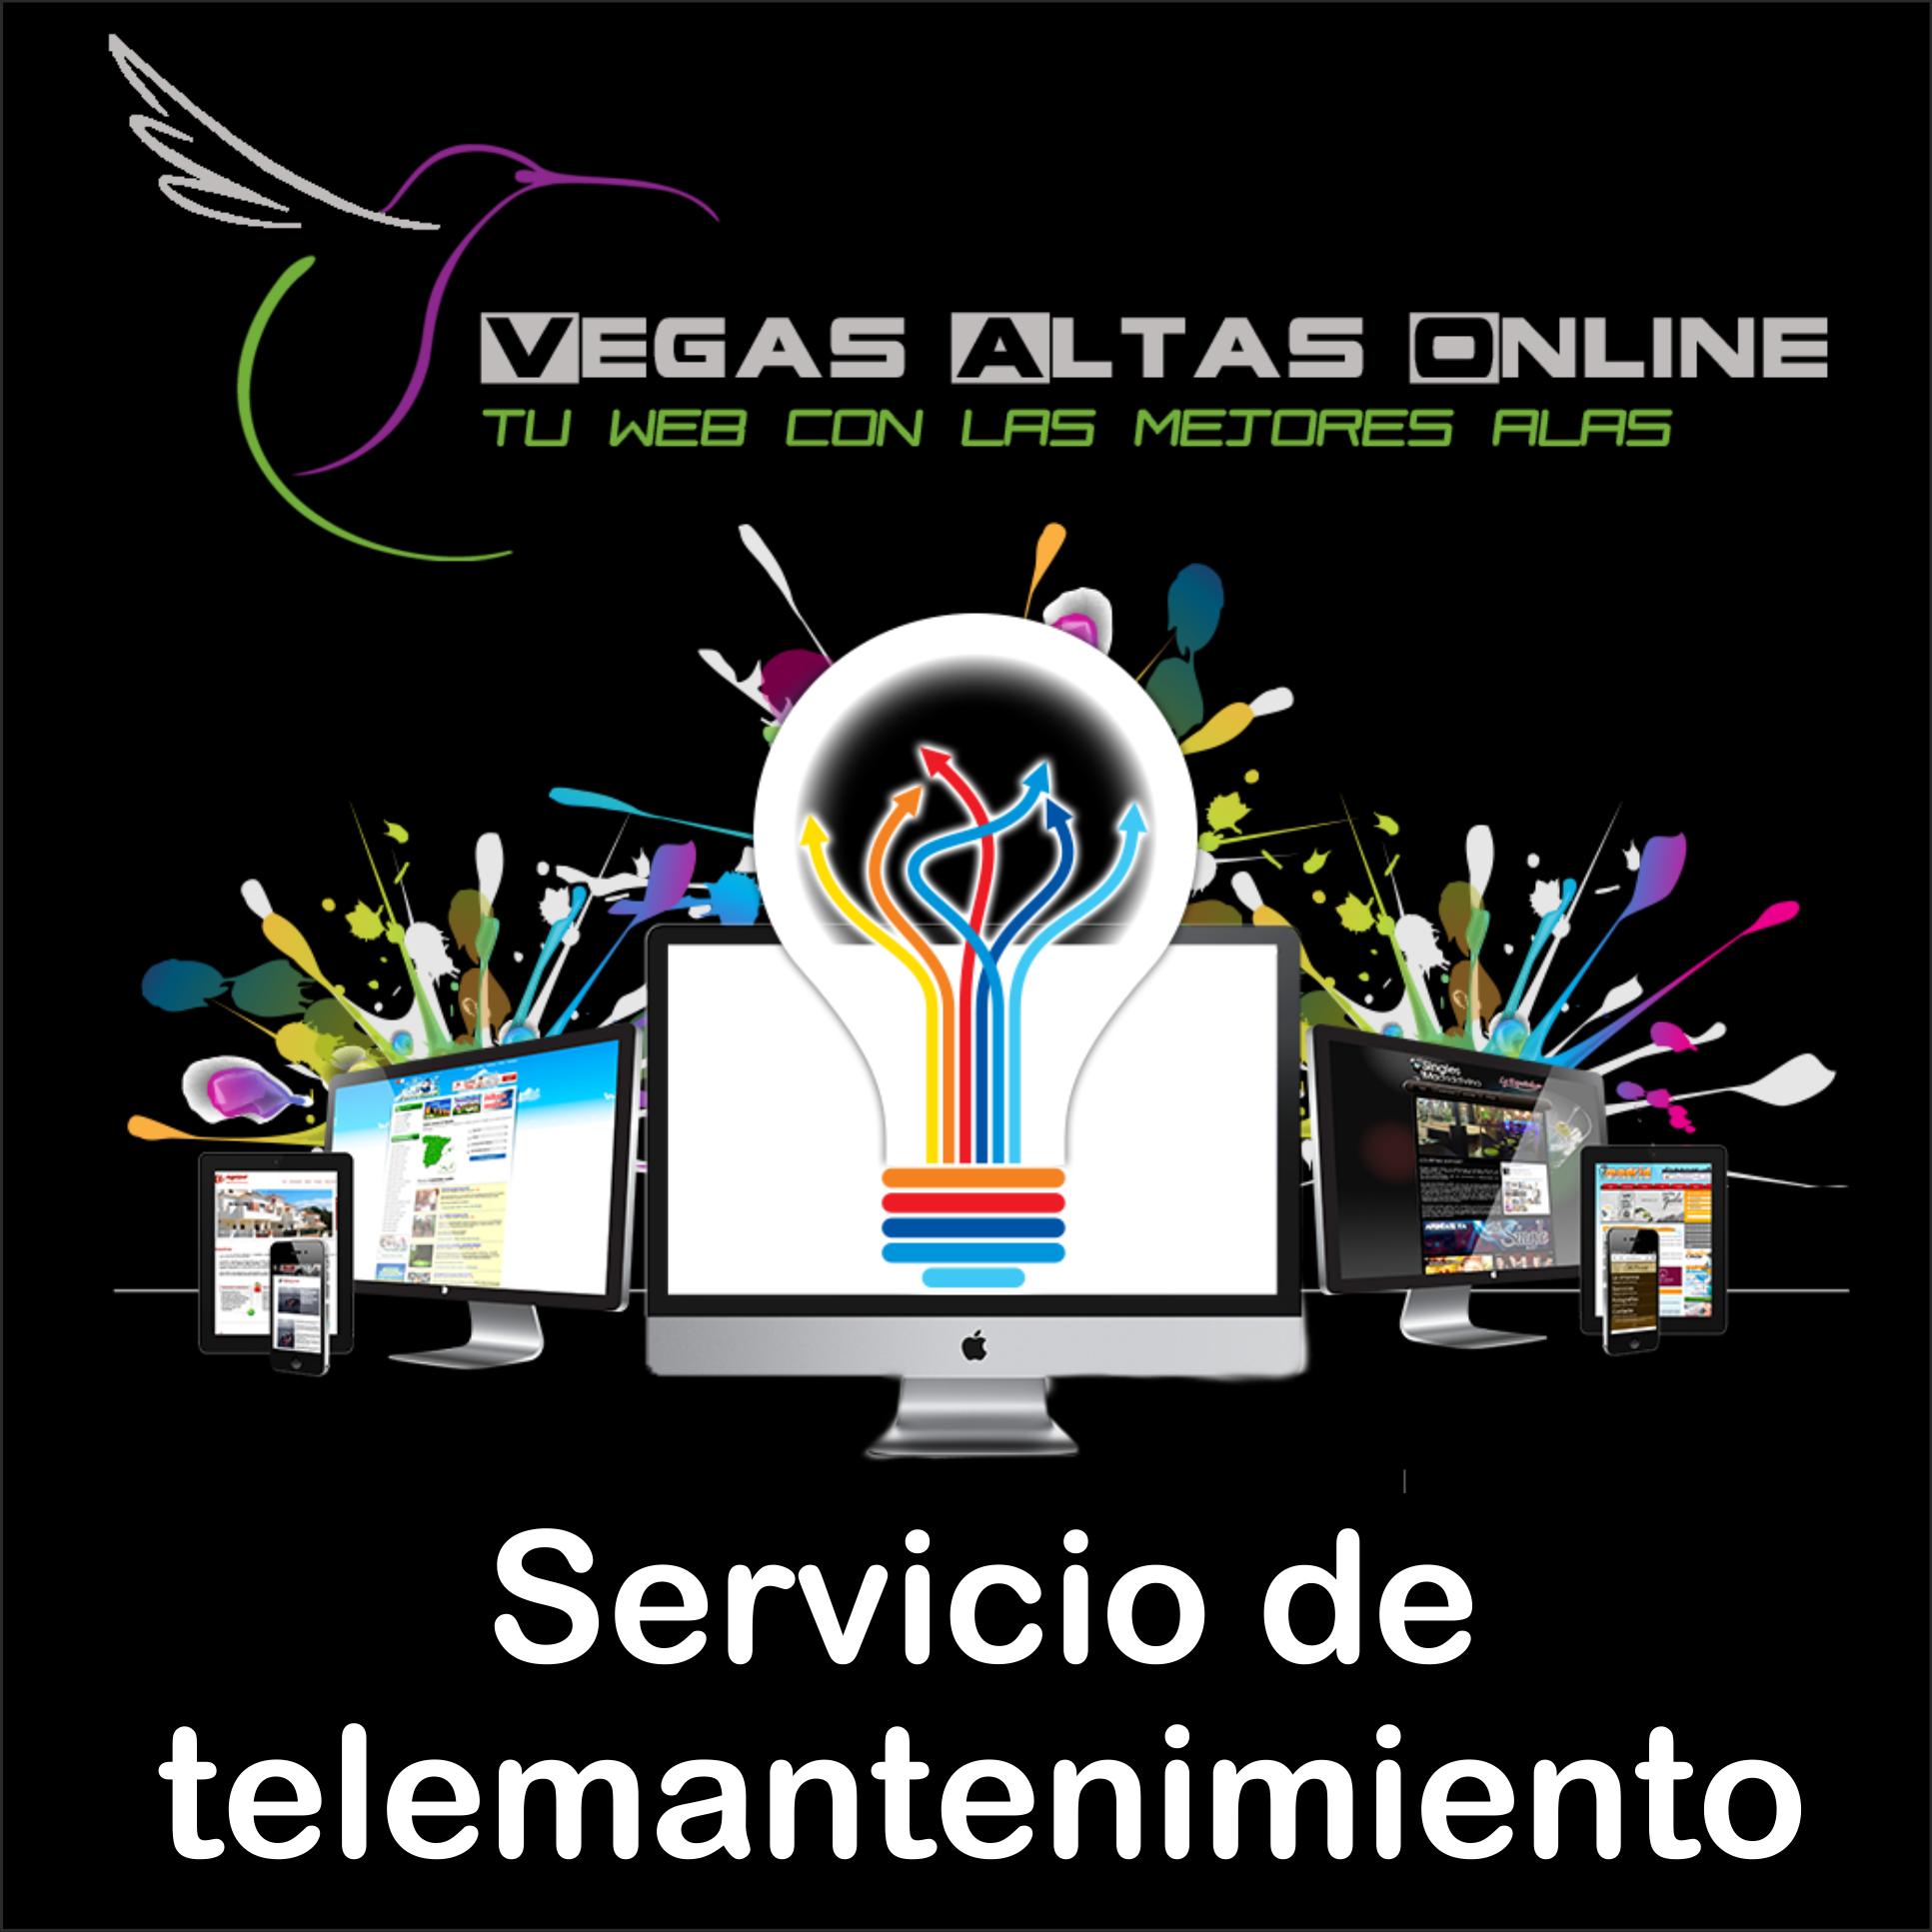 VEGAS ALTAS ONLINE SERVINTEX